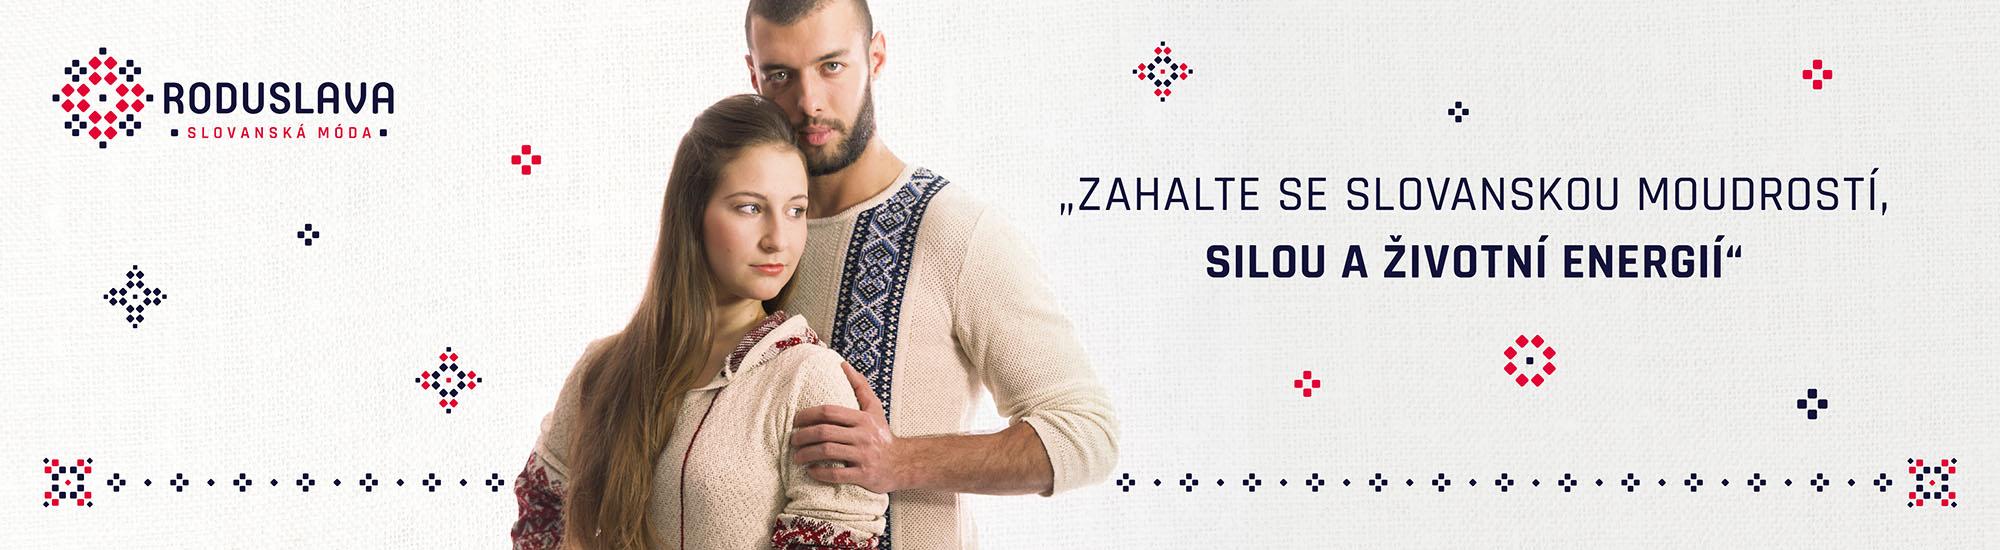 Pletená móda_zahalte se